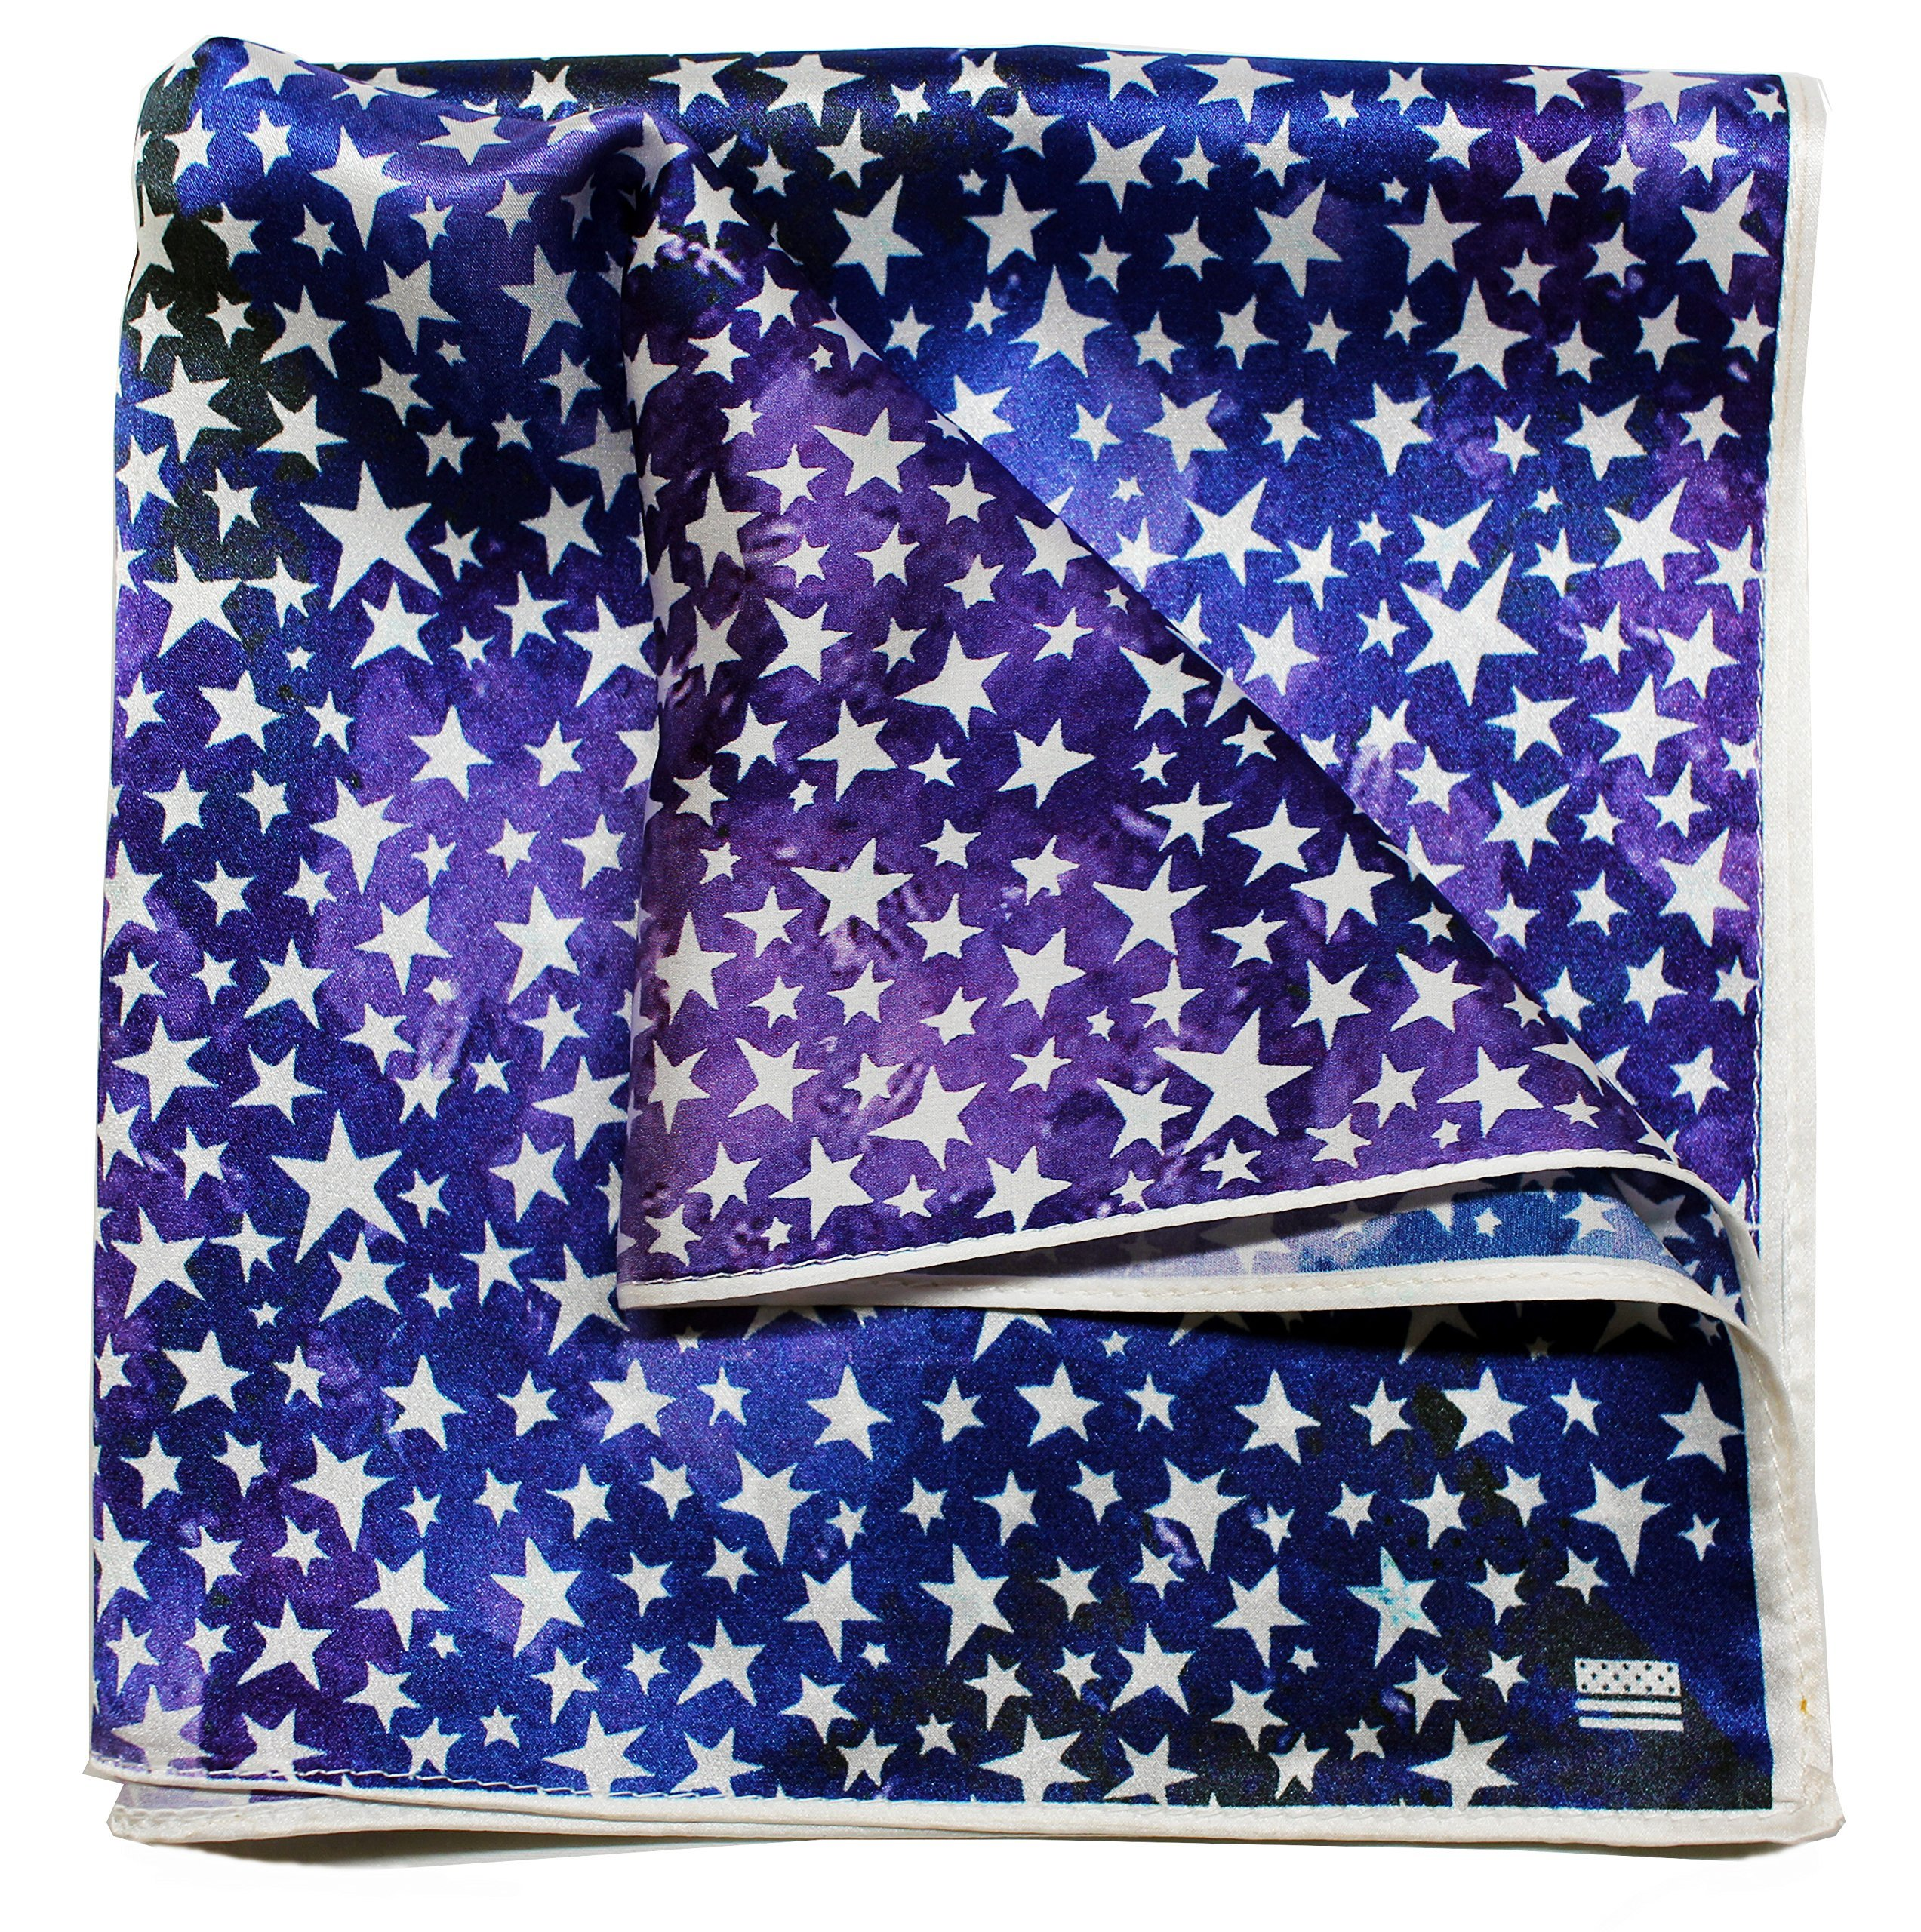 Silk Pocket Square by American Pocket Square Company | Artistic, Pure Silk, Premium Quality for Men: ''Mr. Van Gogh''